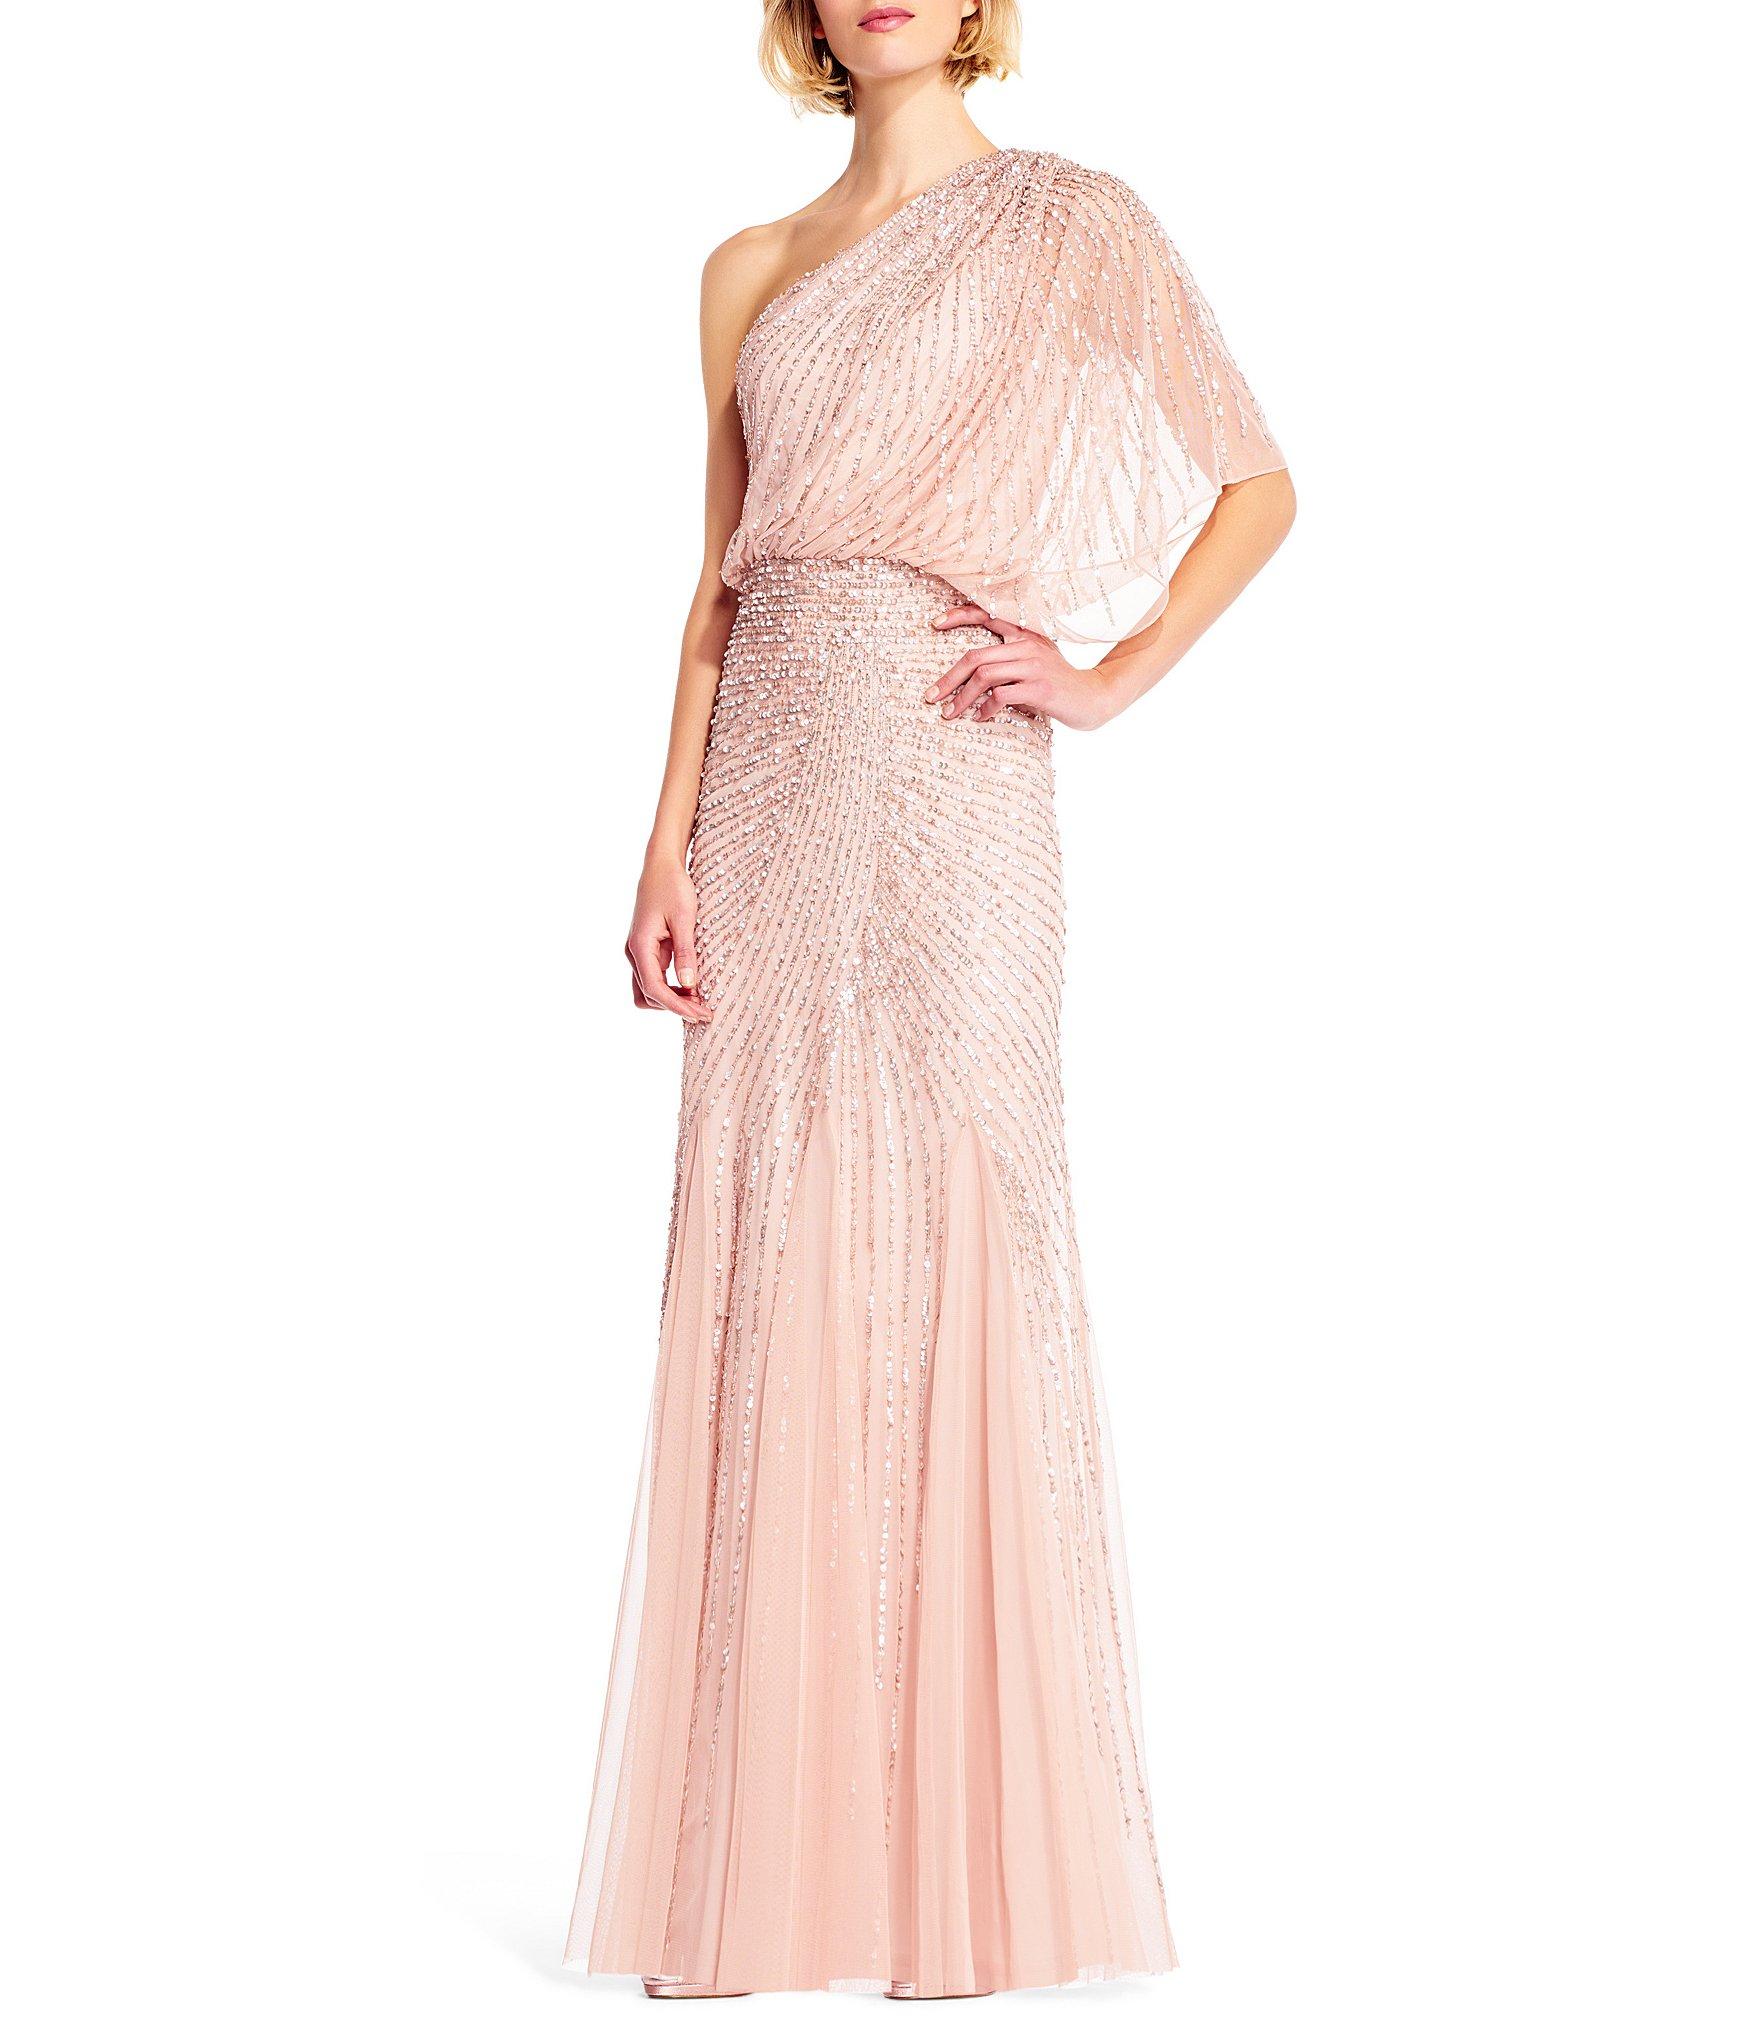 noble lady one shoulder prom dress – fashion dresses